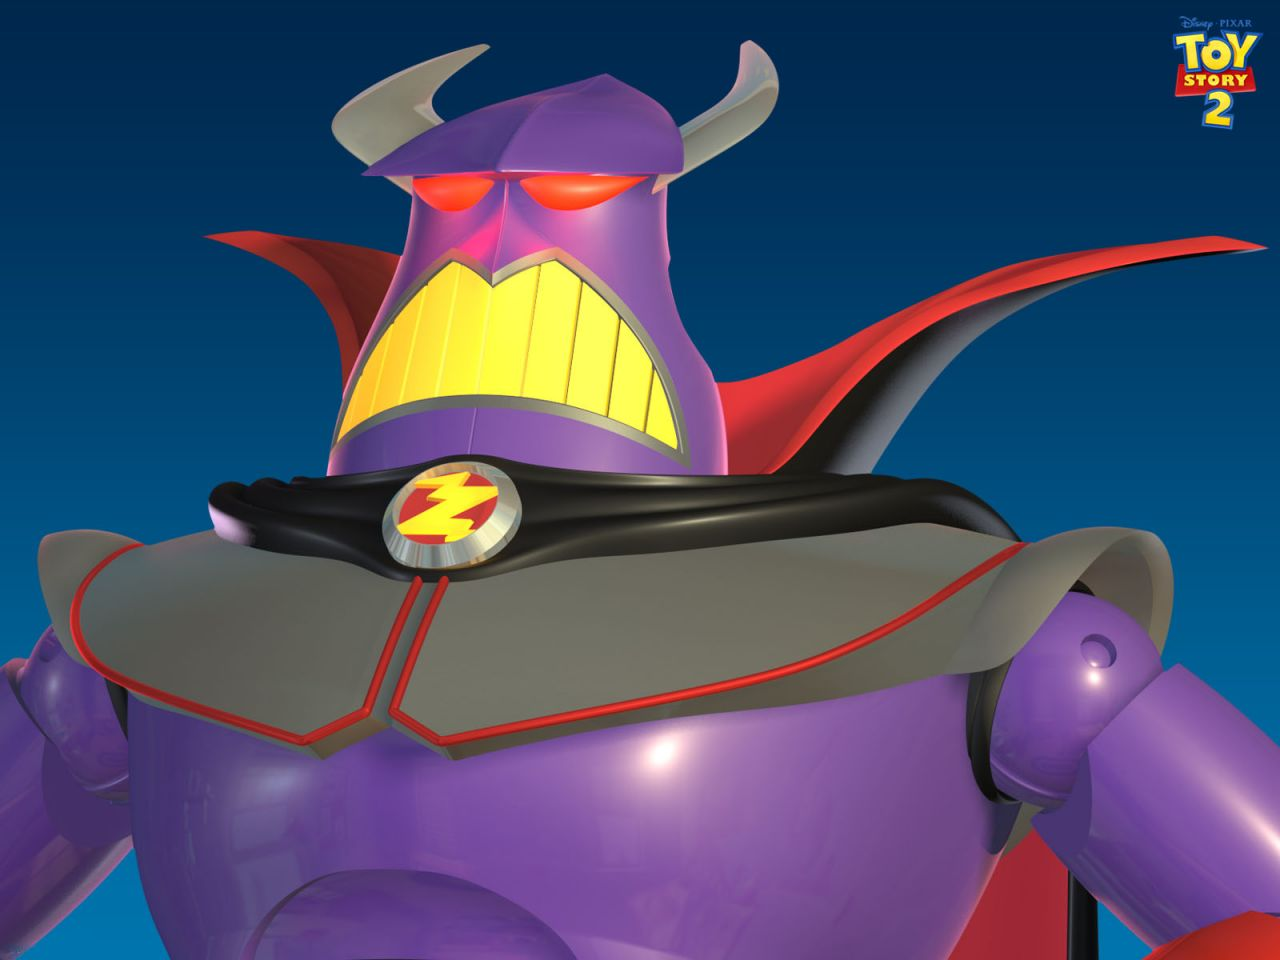 Zurg Headshot Toy Story 2 Wallpaper 1280x960